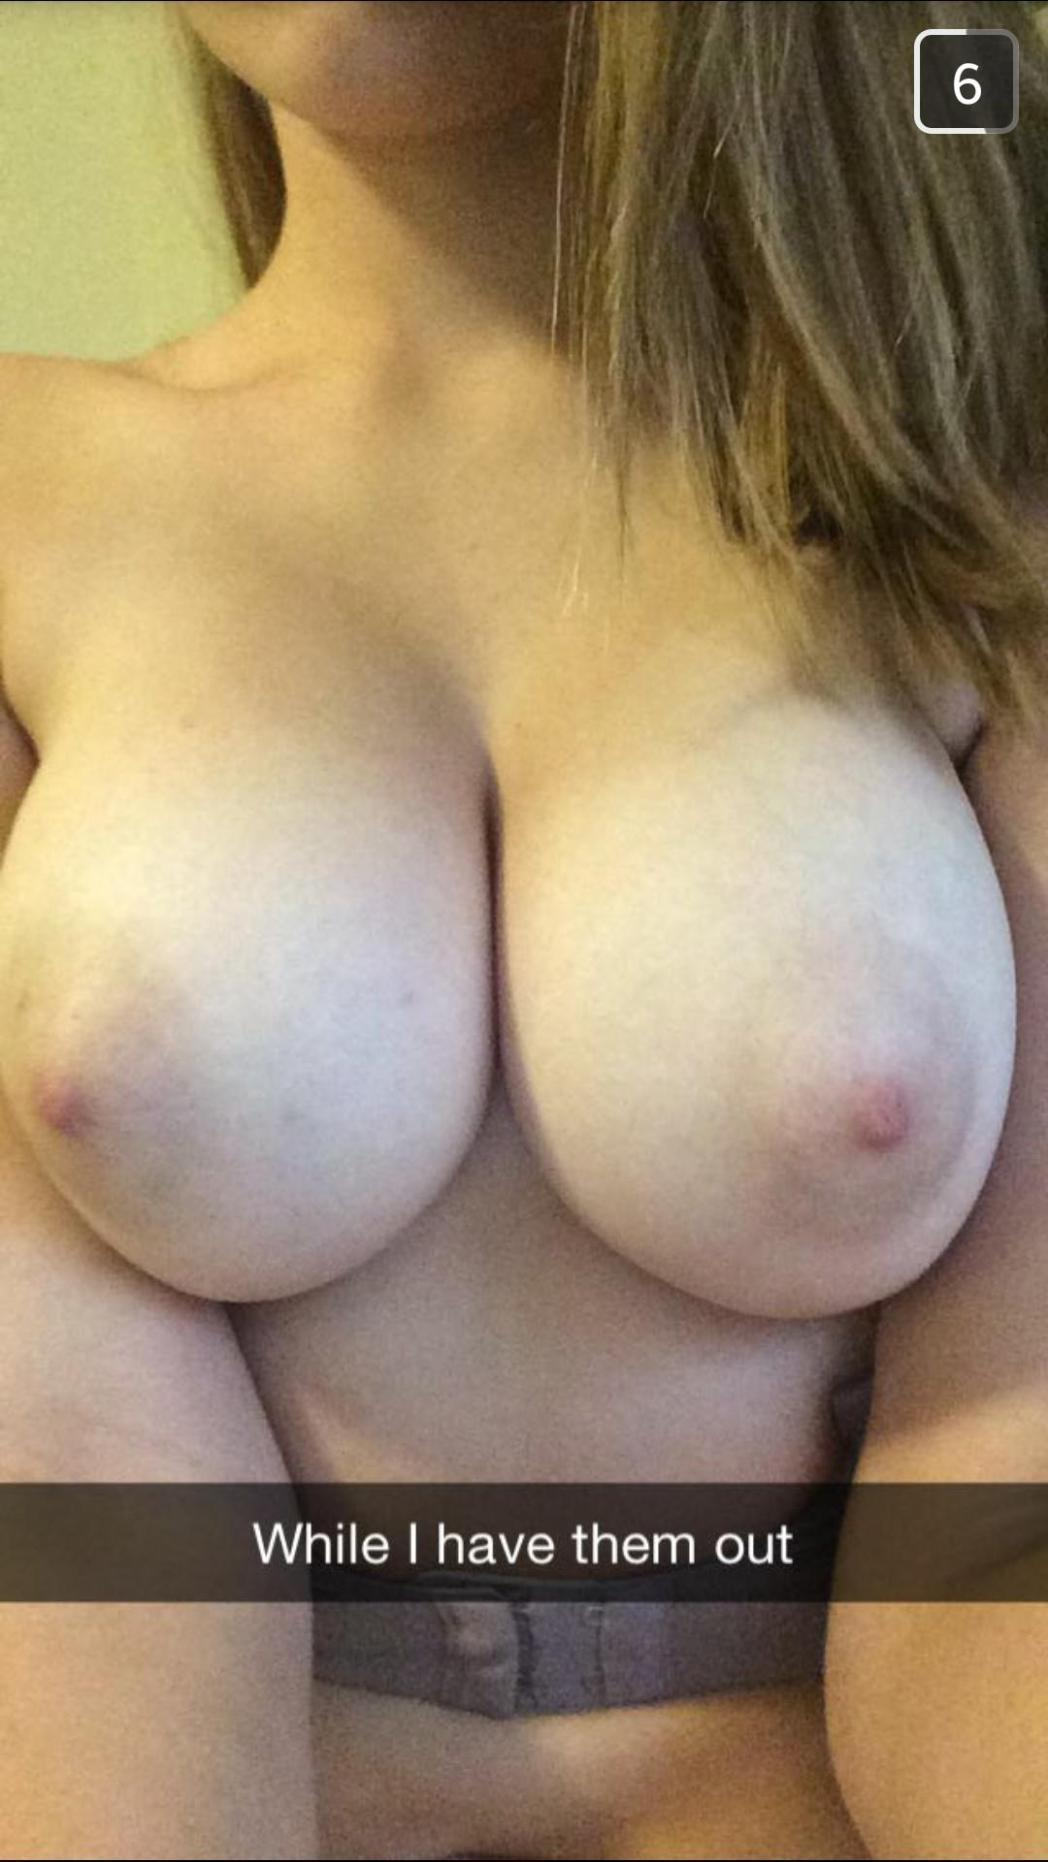 evangeline lilly free porn pics pichunter